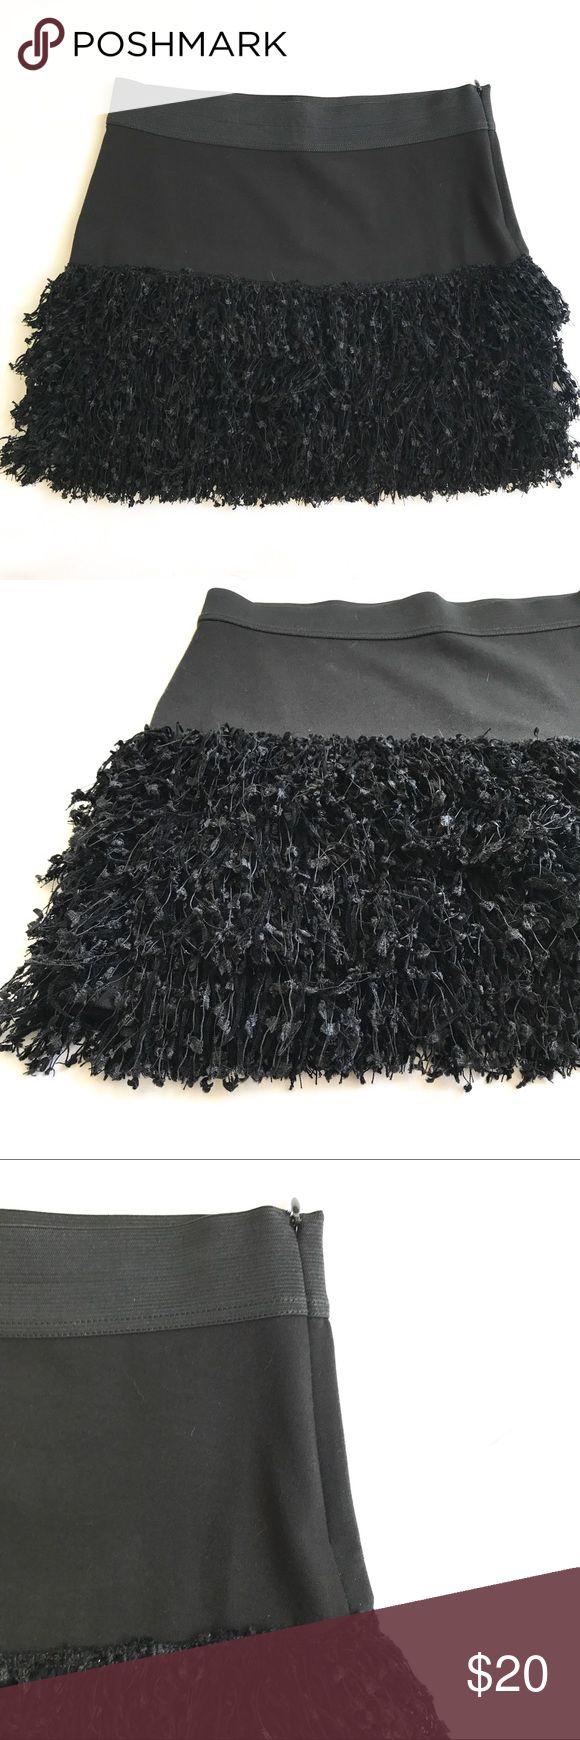 Jessica Simpson party skirt Jessica Simpson black party skirt Jessica Simpson Skirts Mini